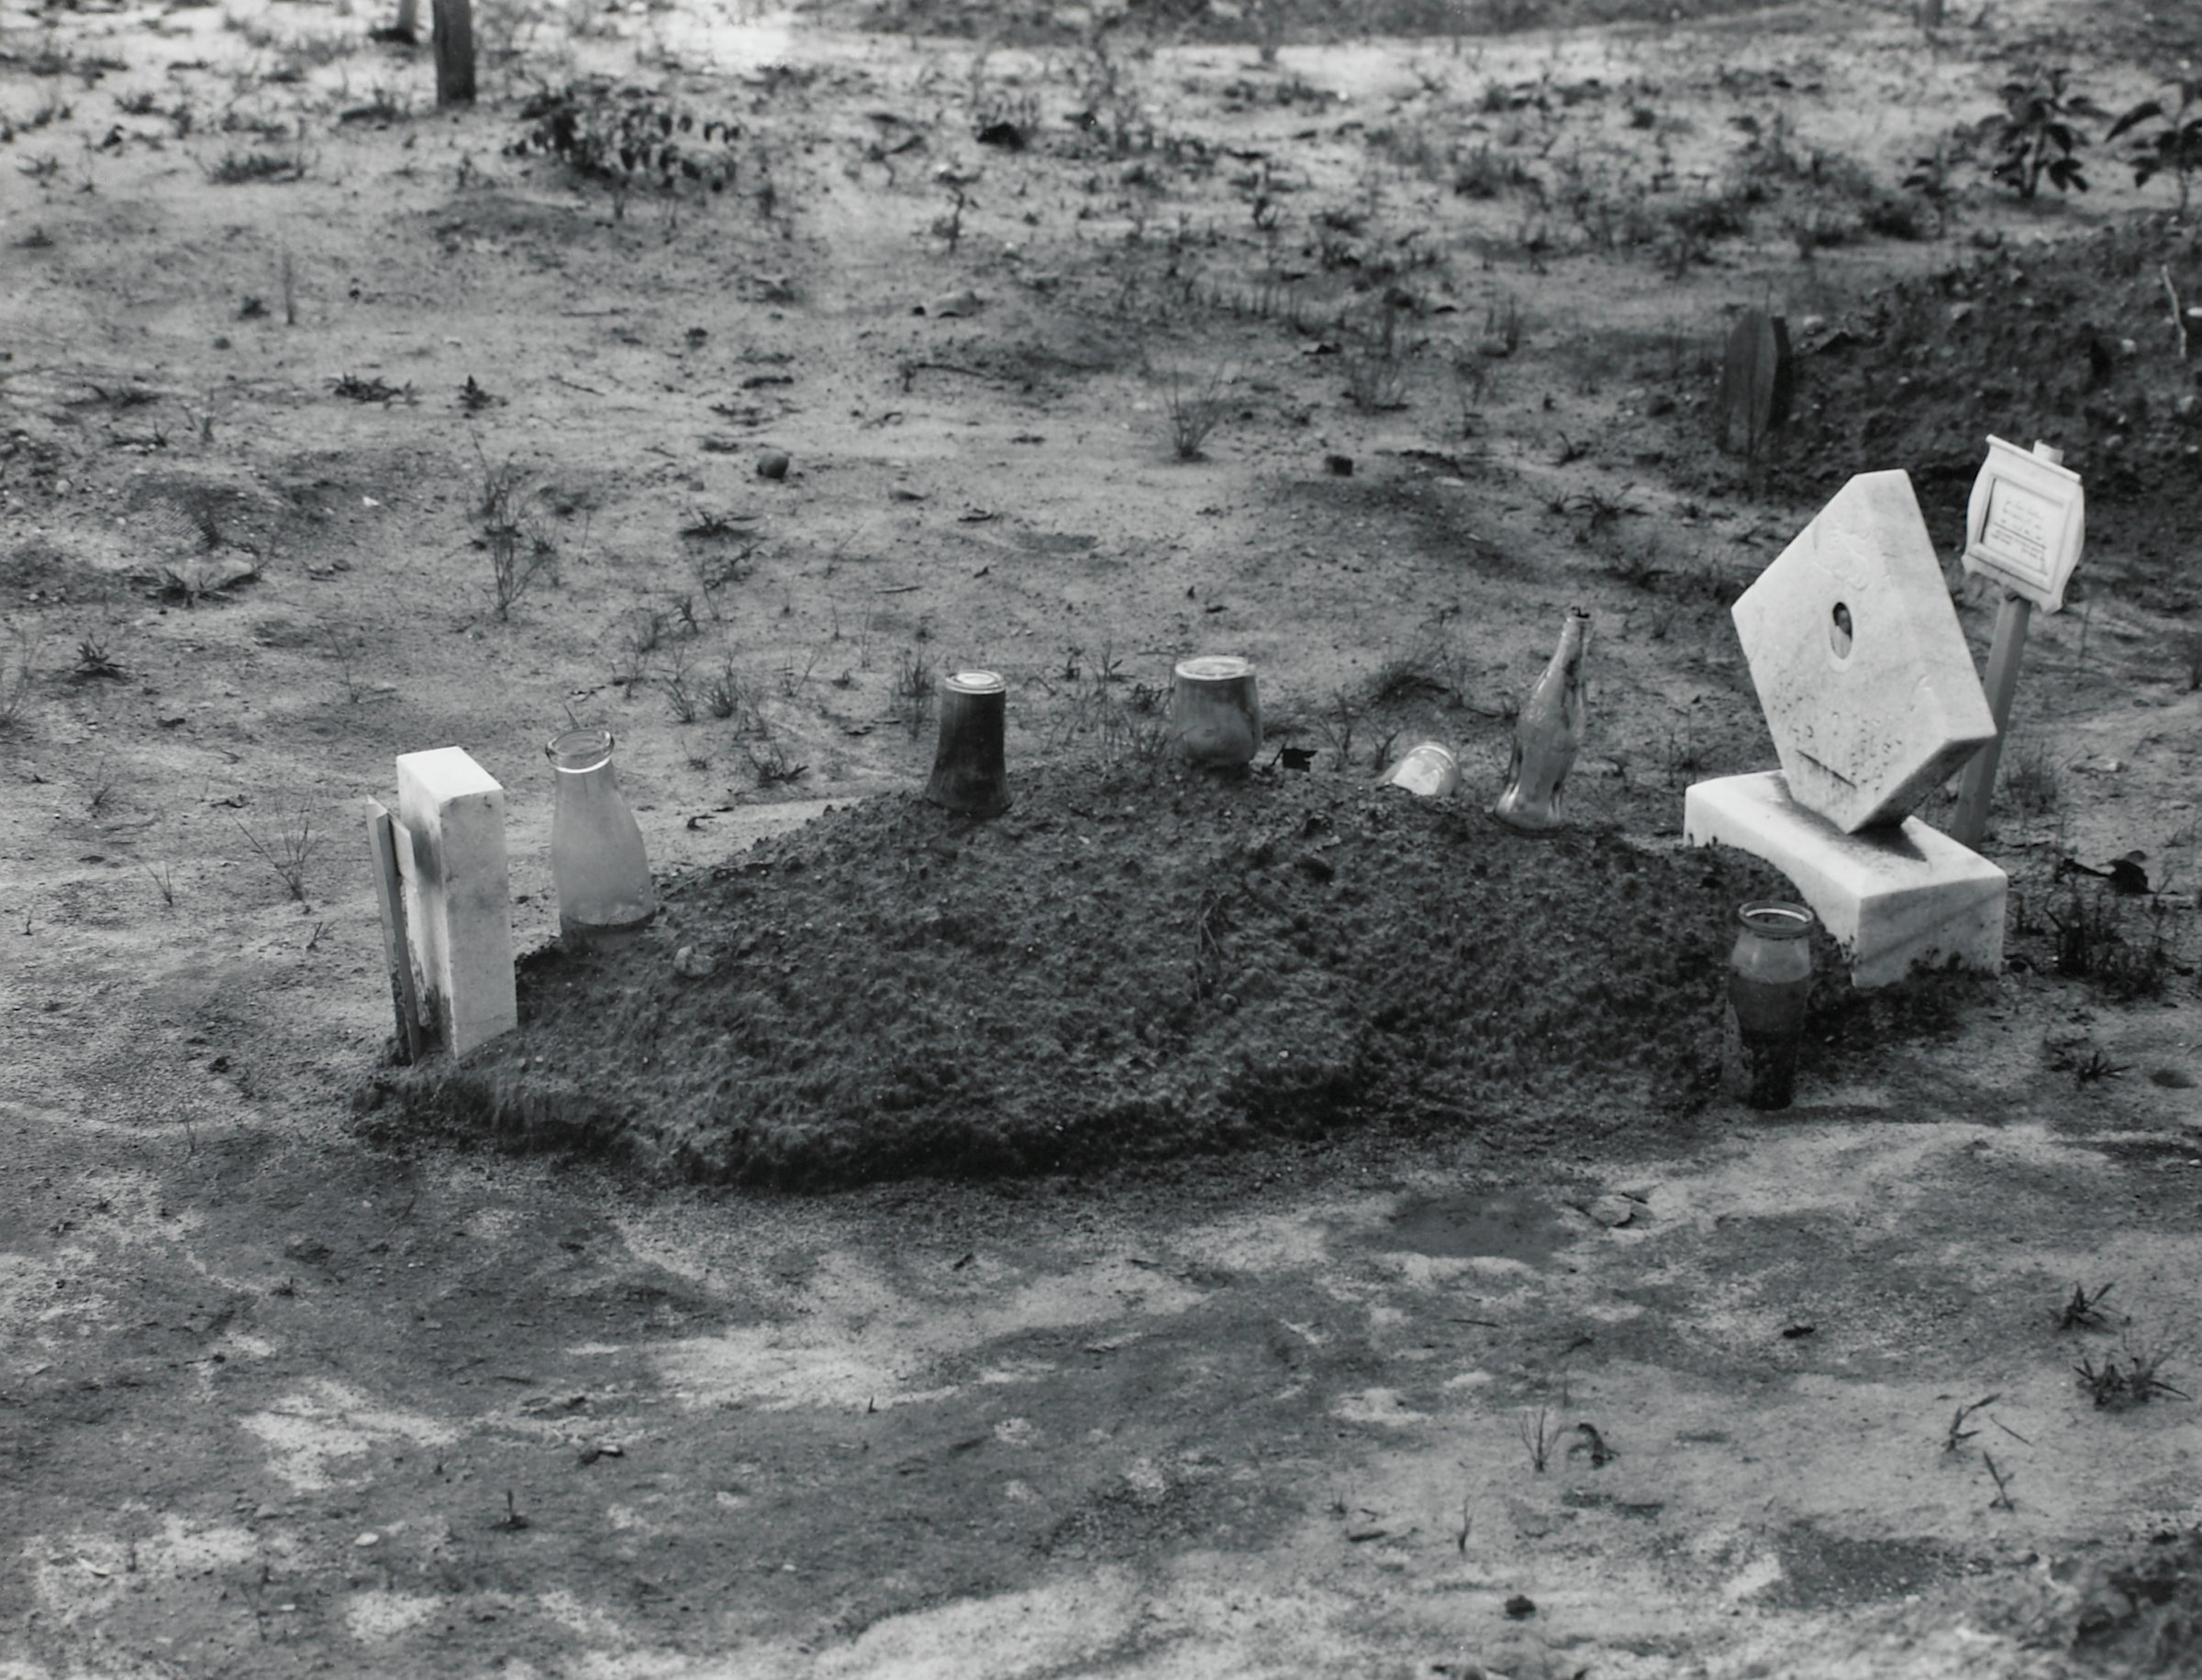 A child's grave, Hale County, Alabama, Walker Evans, gelatin silver print